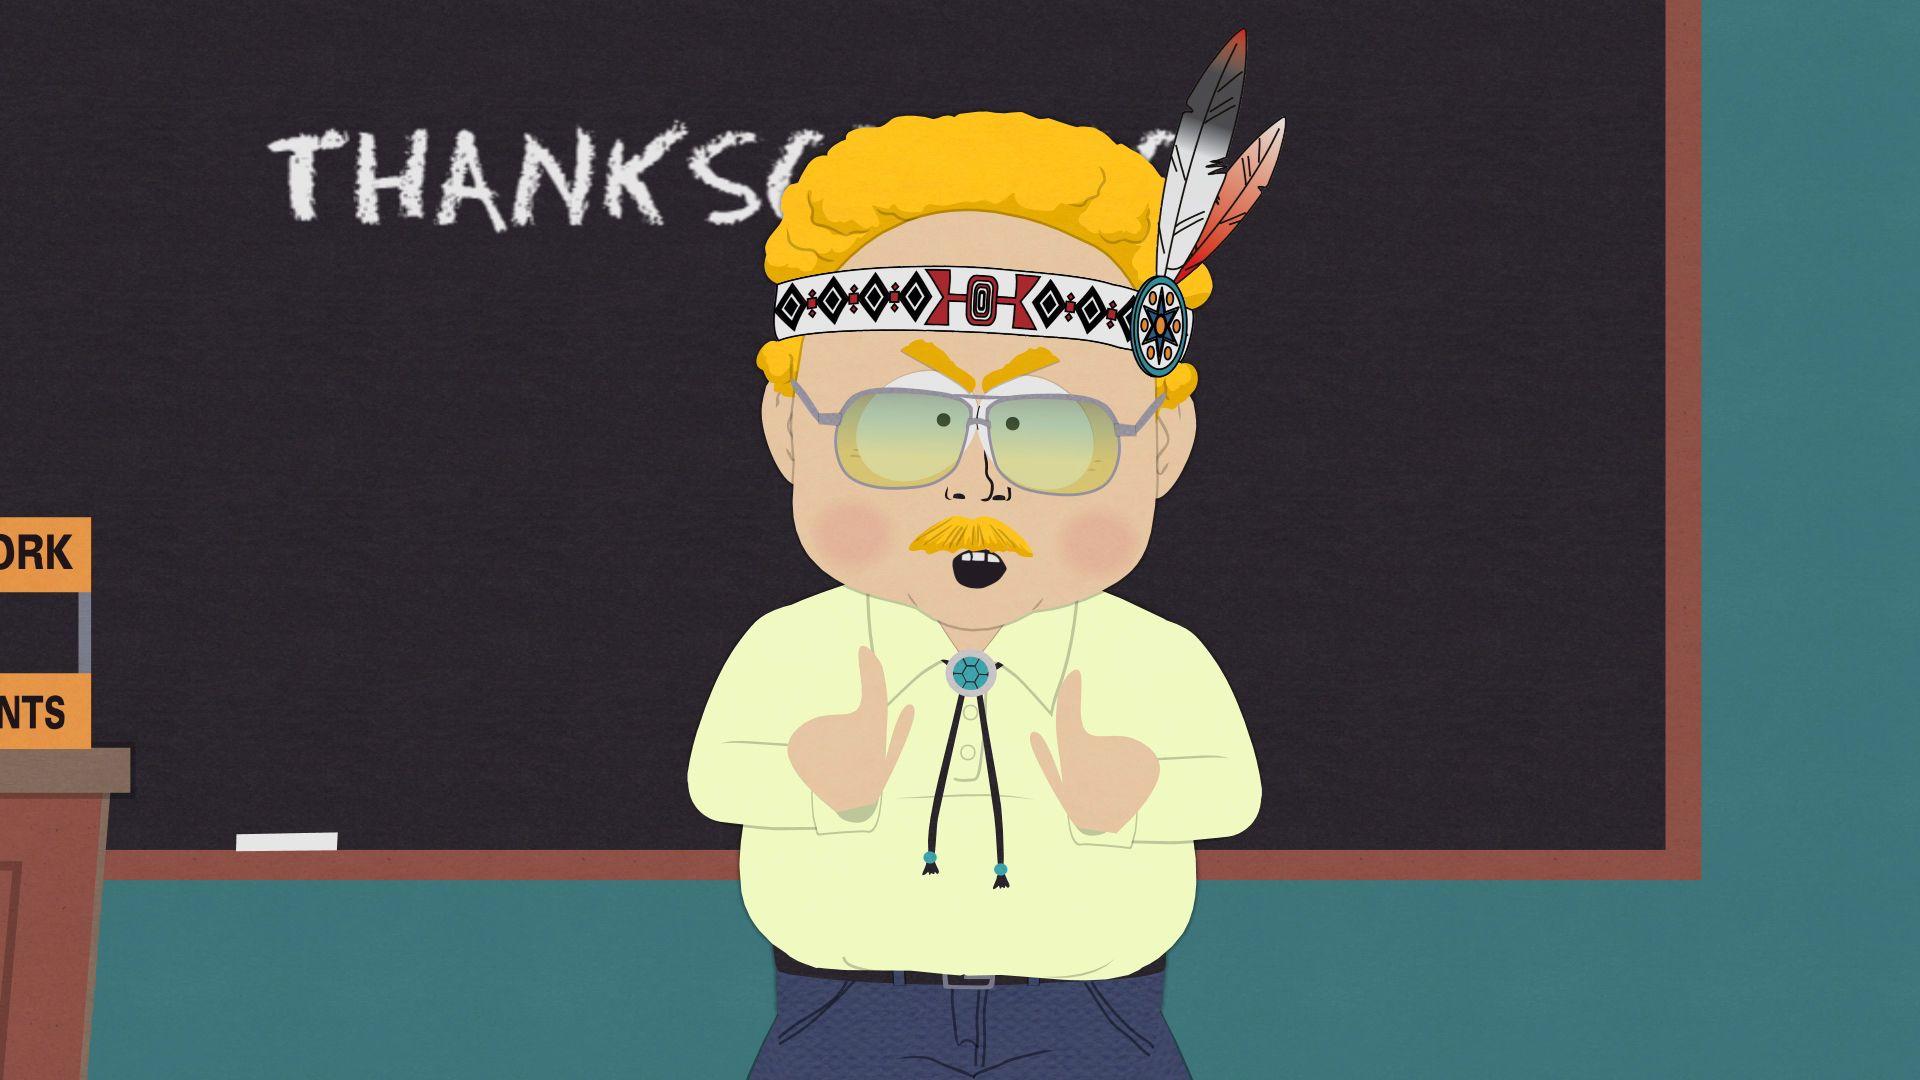 ureinwohner amerikas